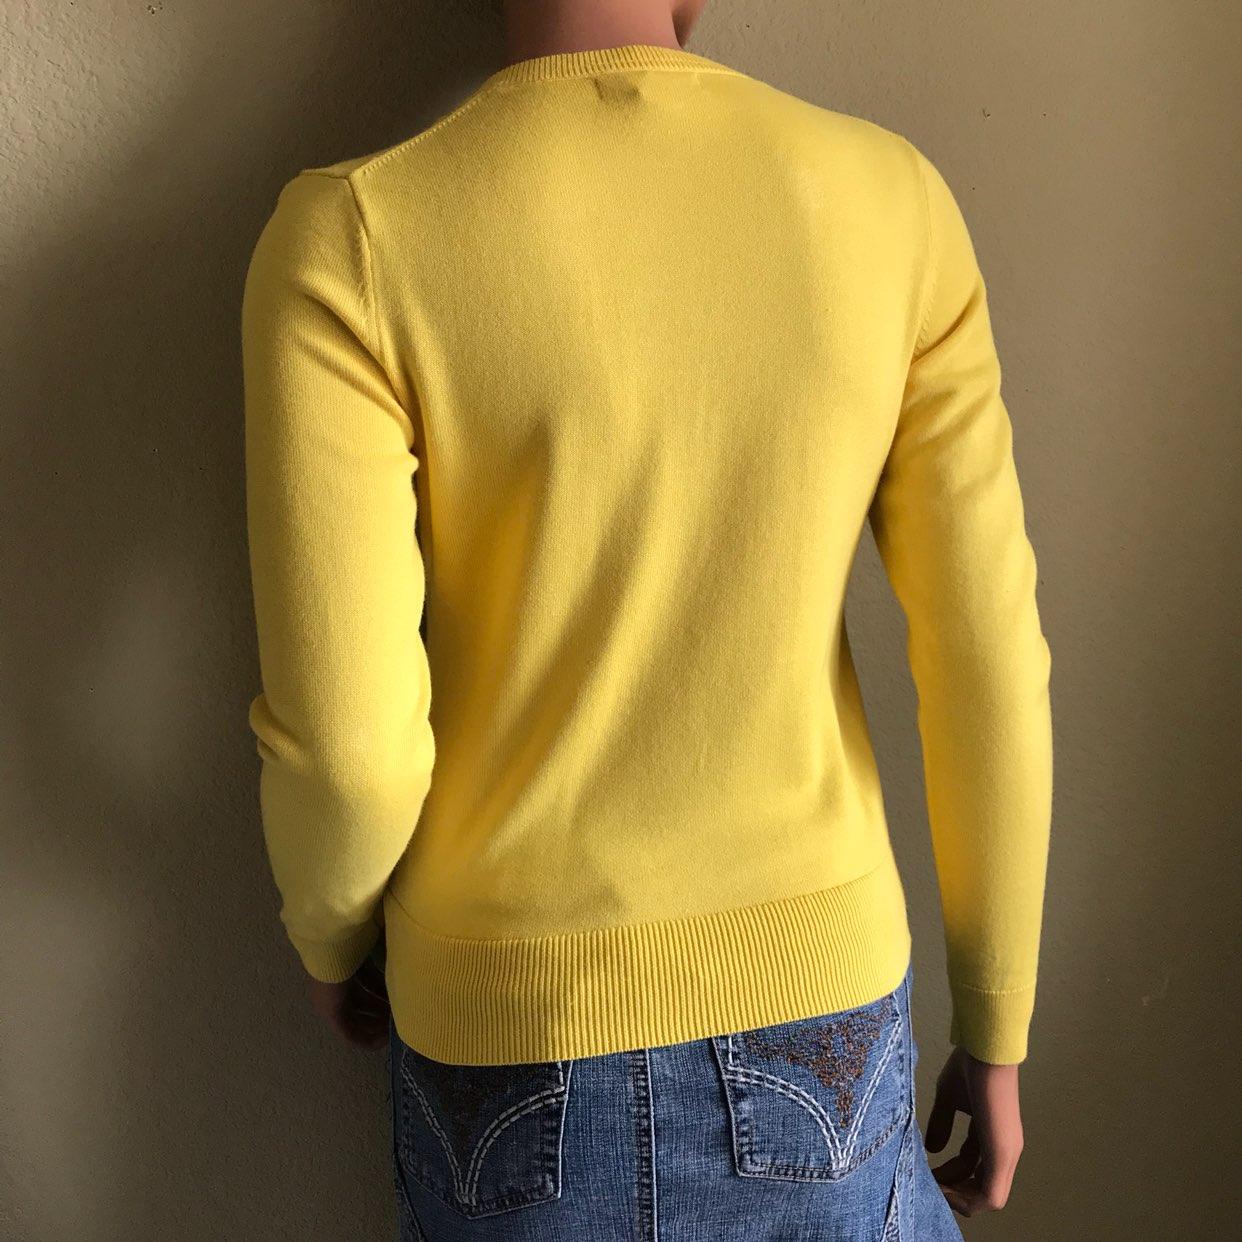 Banana Republic Yellow Button Up Cardi - Mercari: BUY & SELL ...